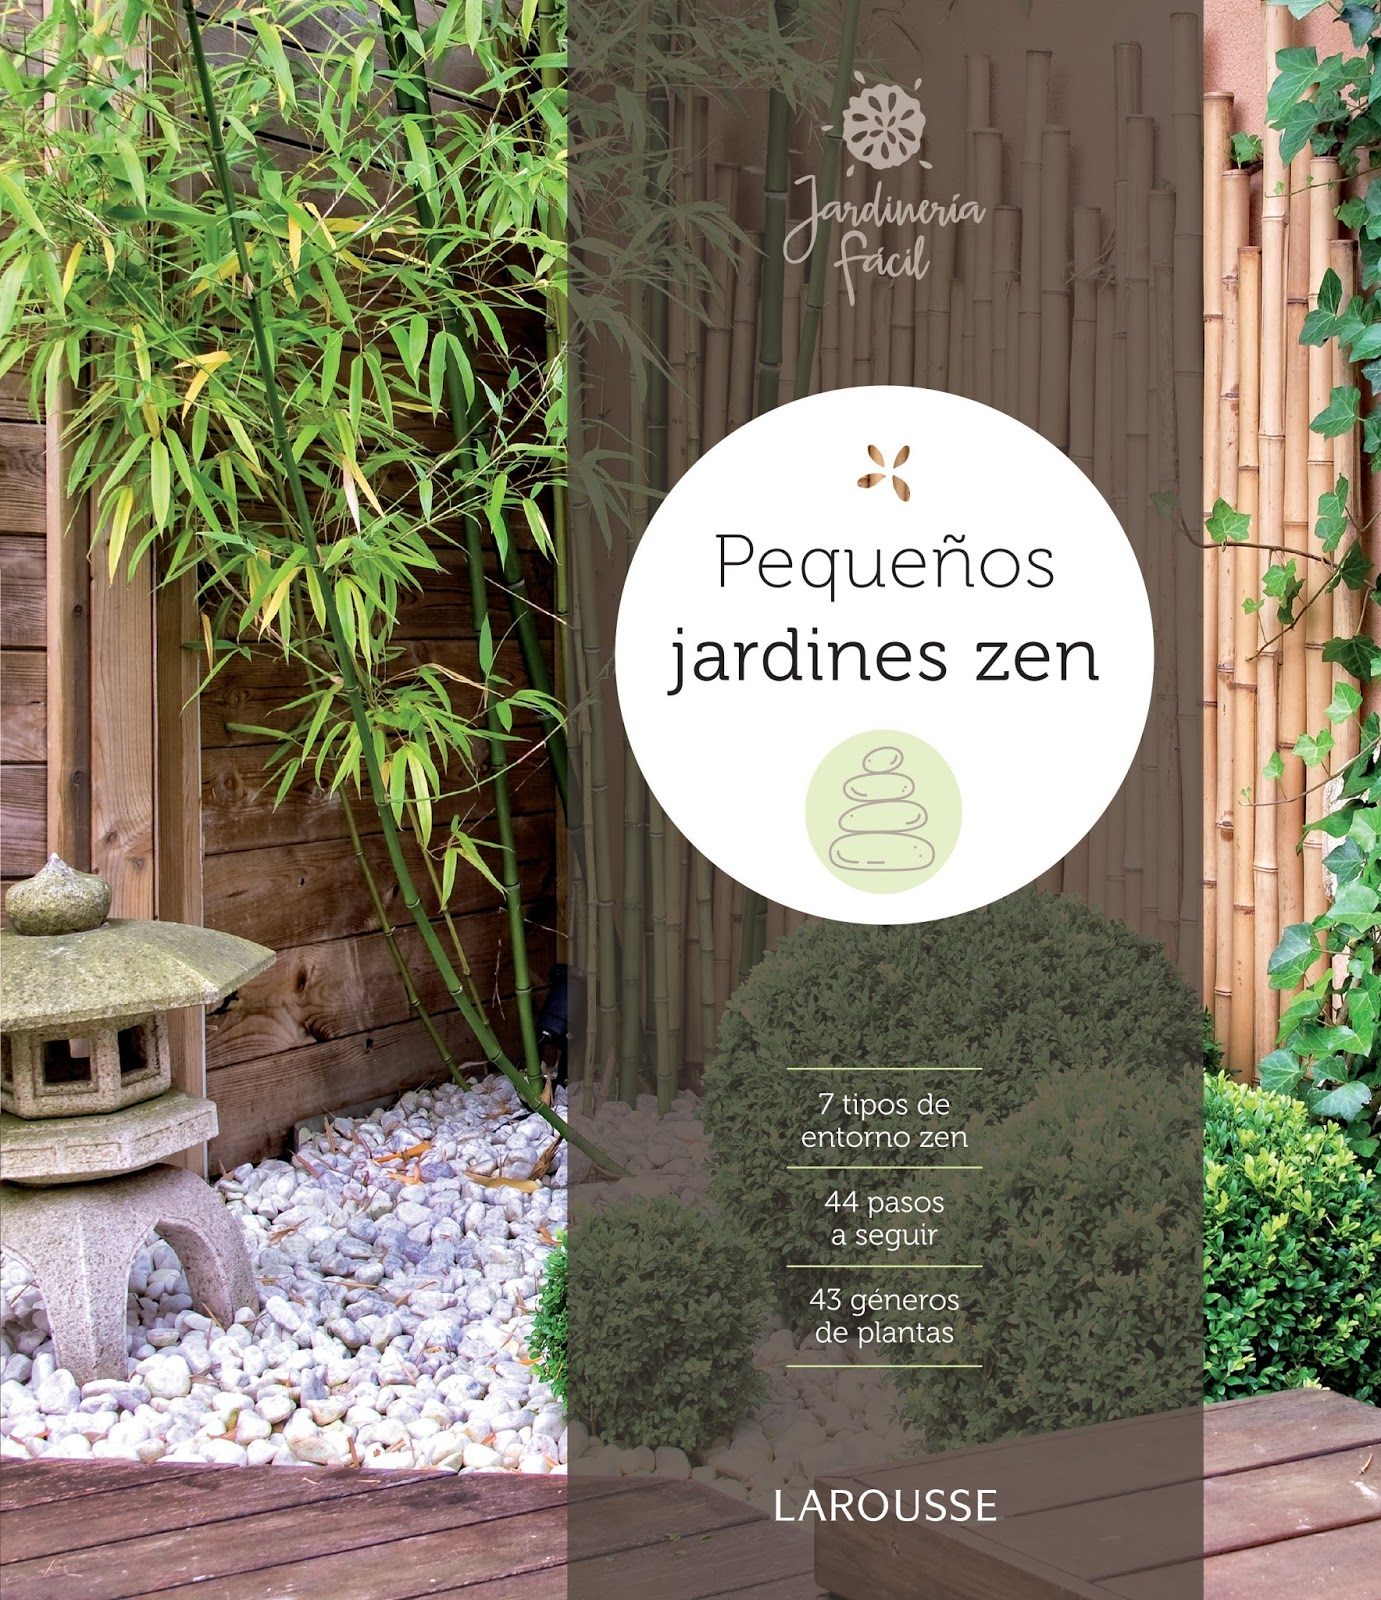 ucpequeos jardines zenud de la editorial larousse